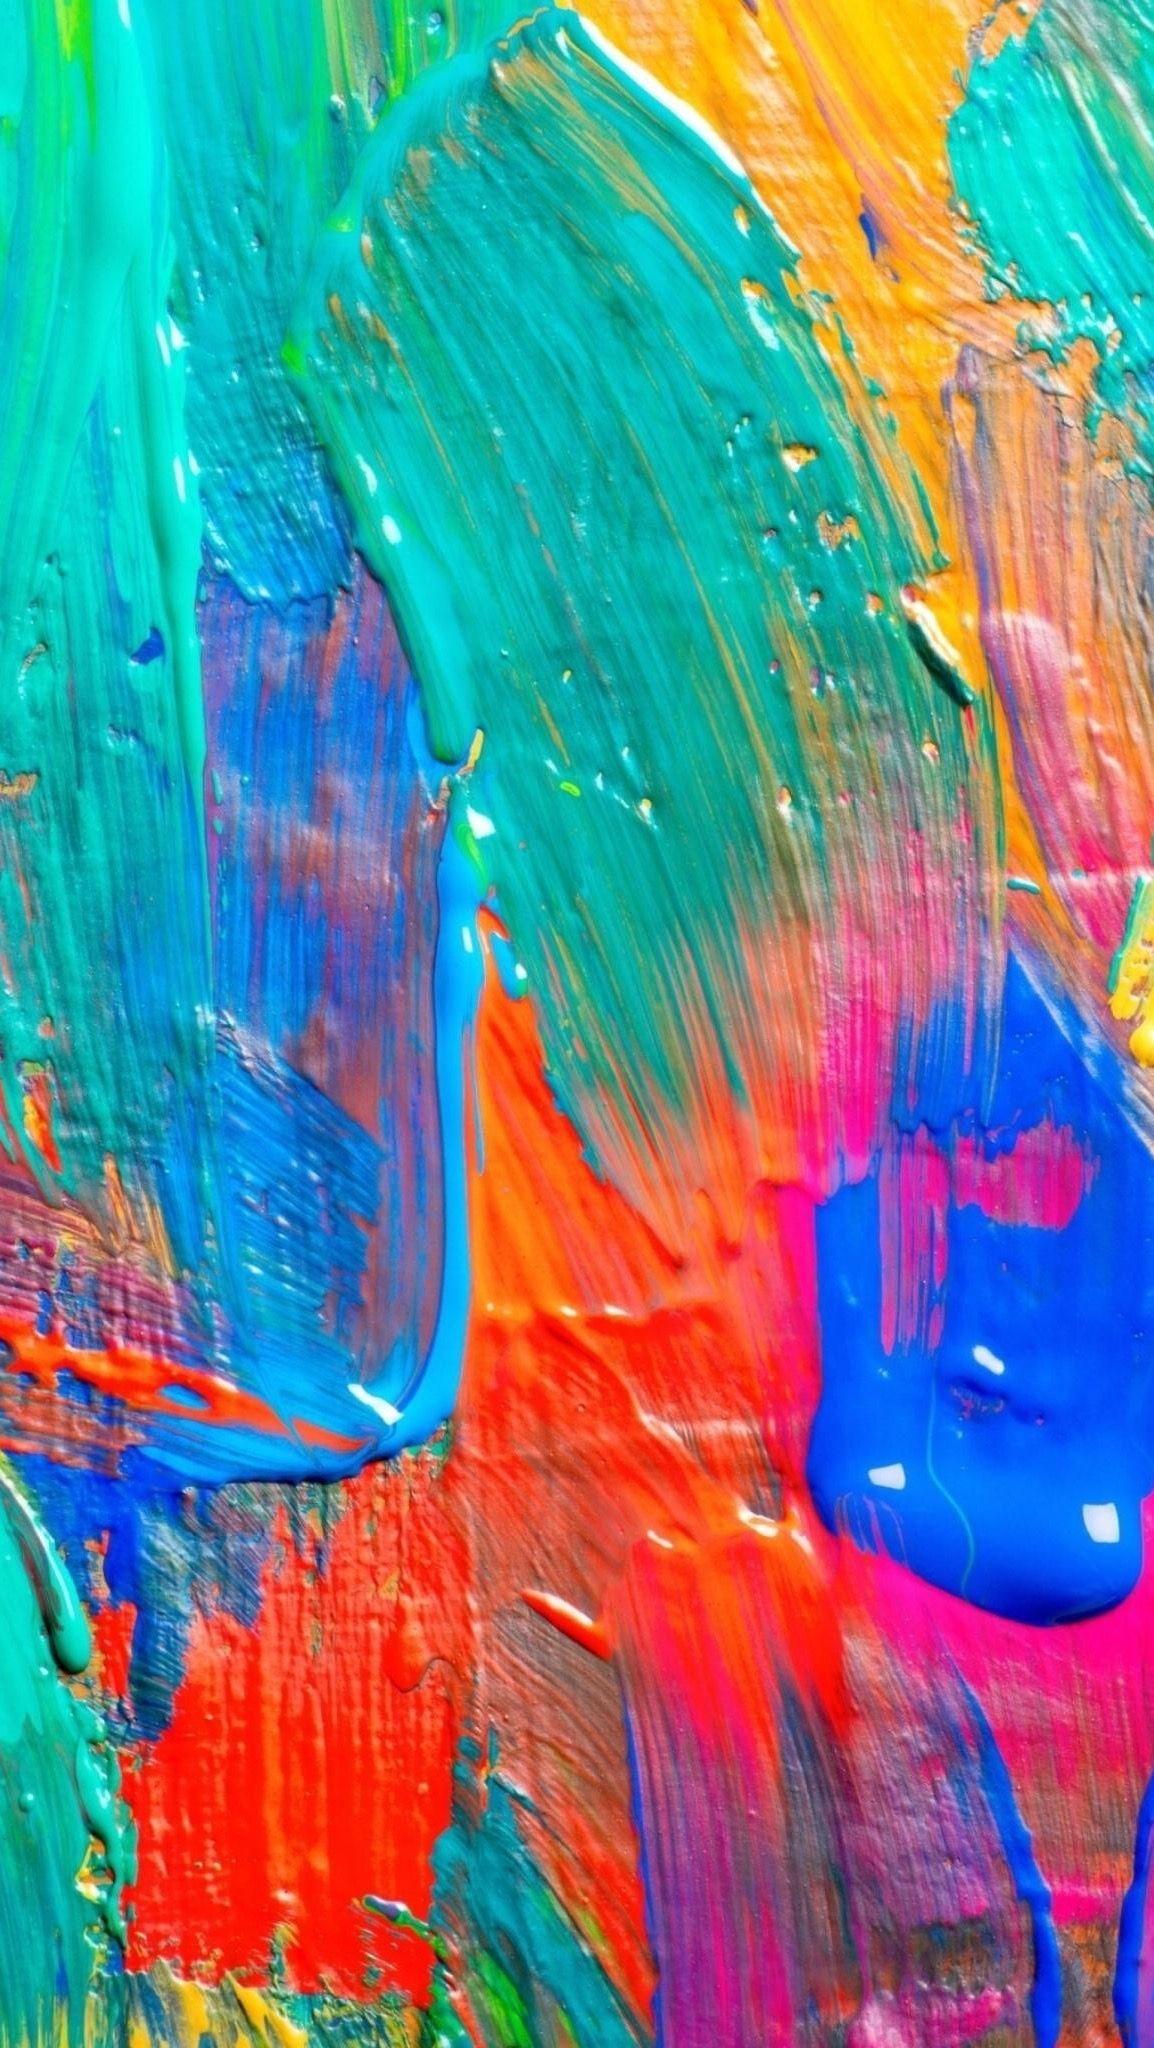 HD iPhone wallpaper Painting/brush strokes | Wallpapers in 2019 | Iphone wallpaper texture ...